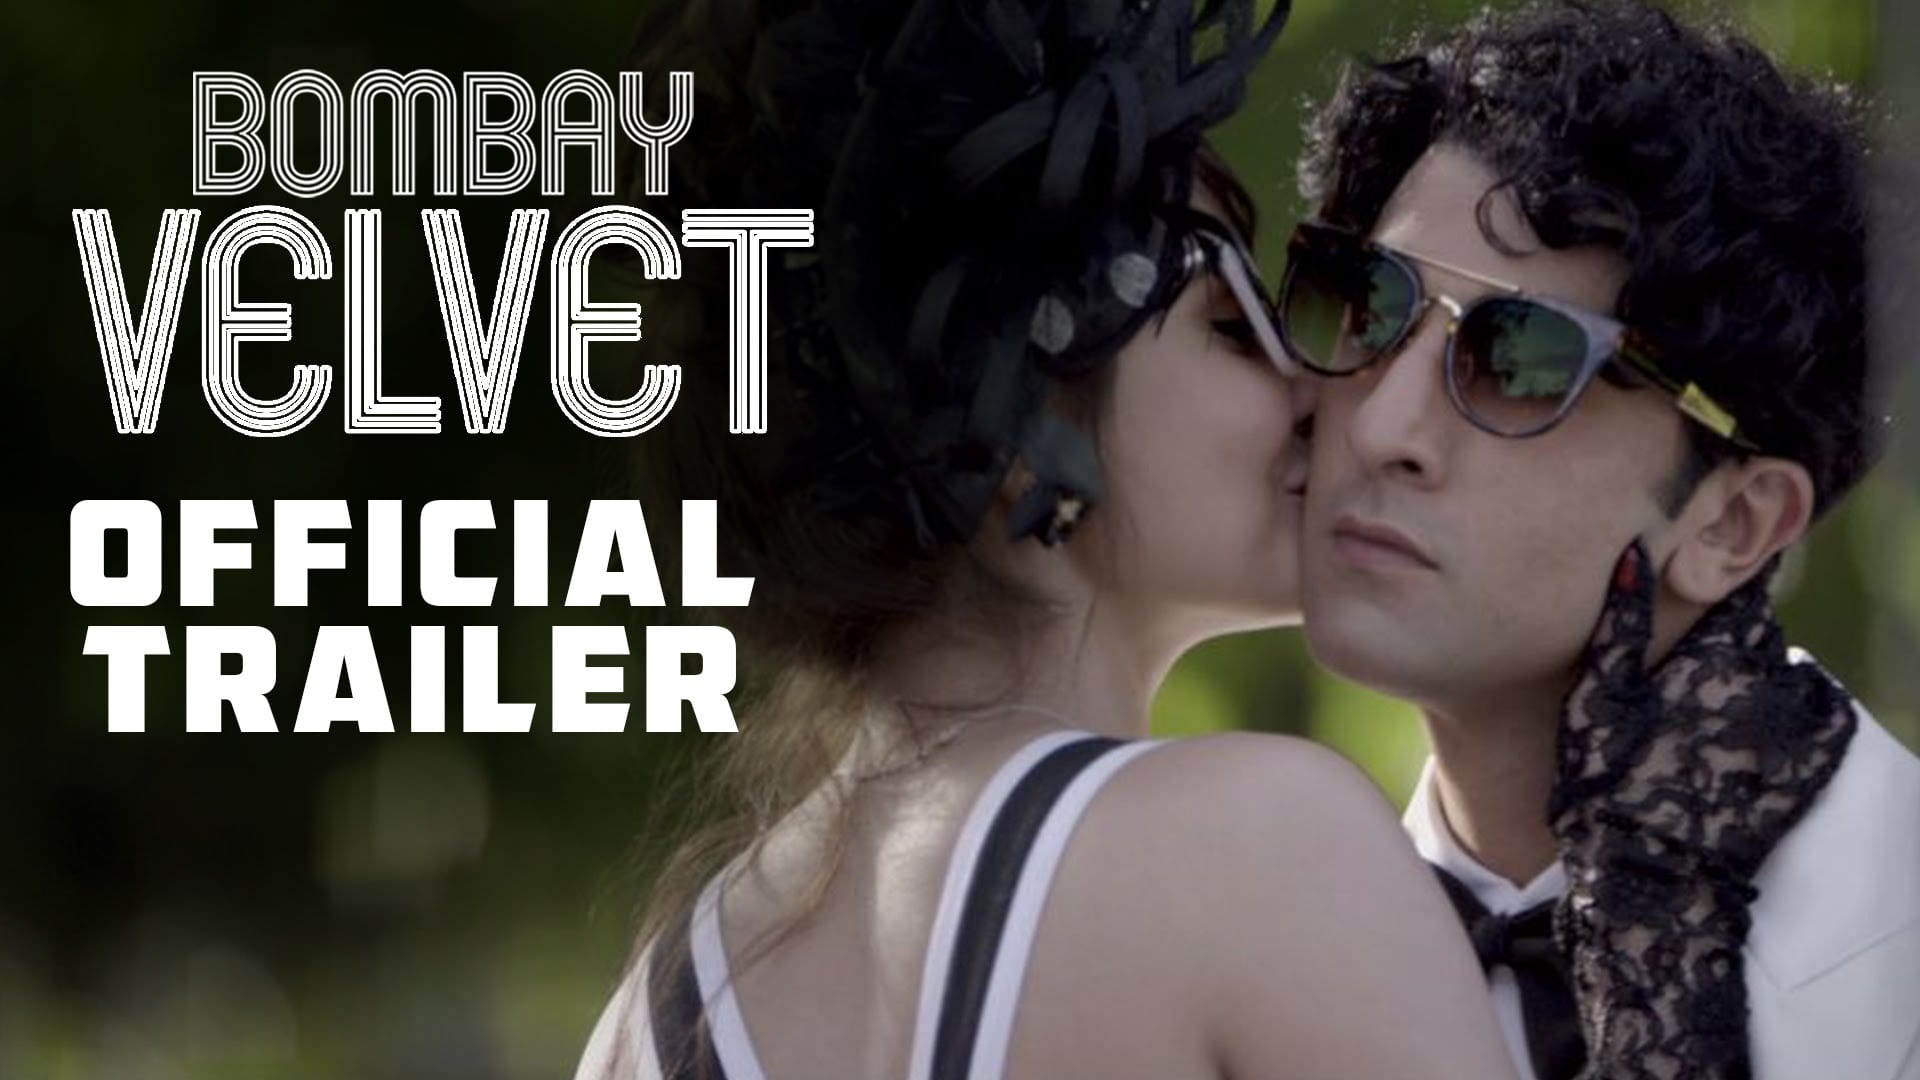 Bombay Velvet Trailer Review : Looks Authentic But Boring